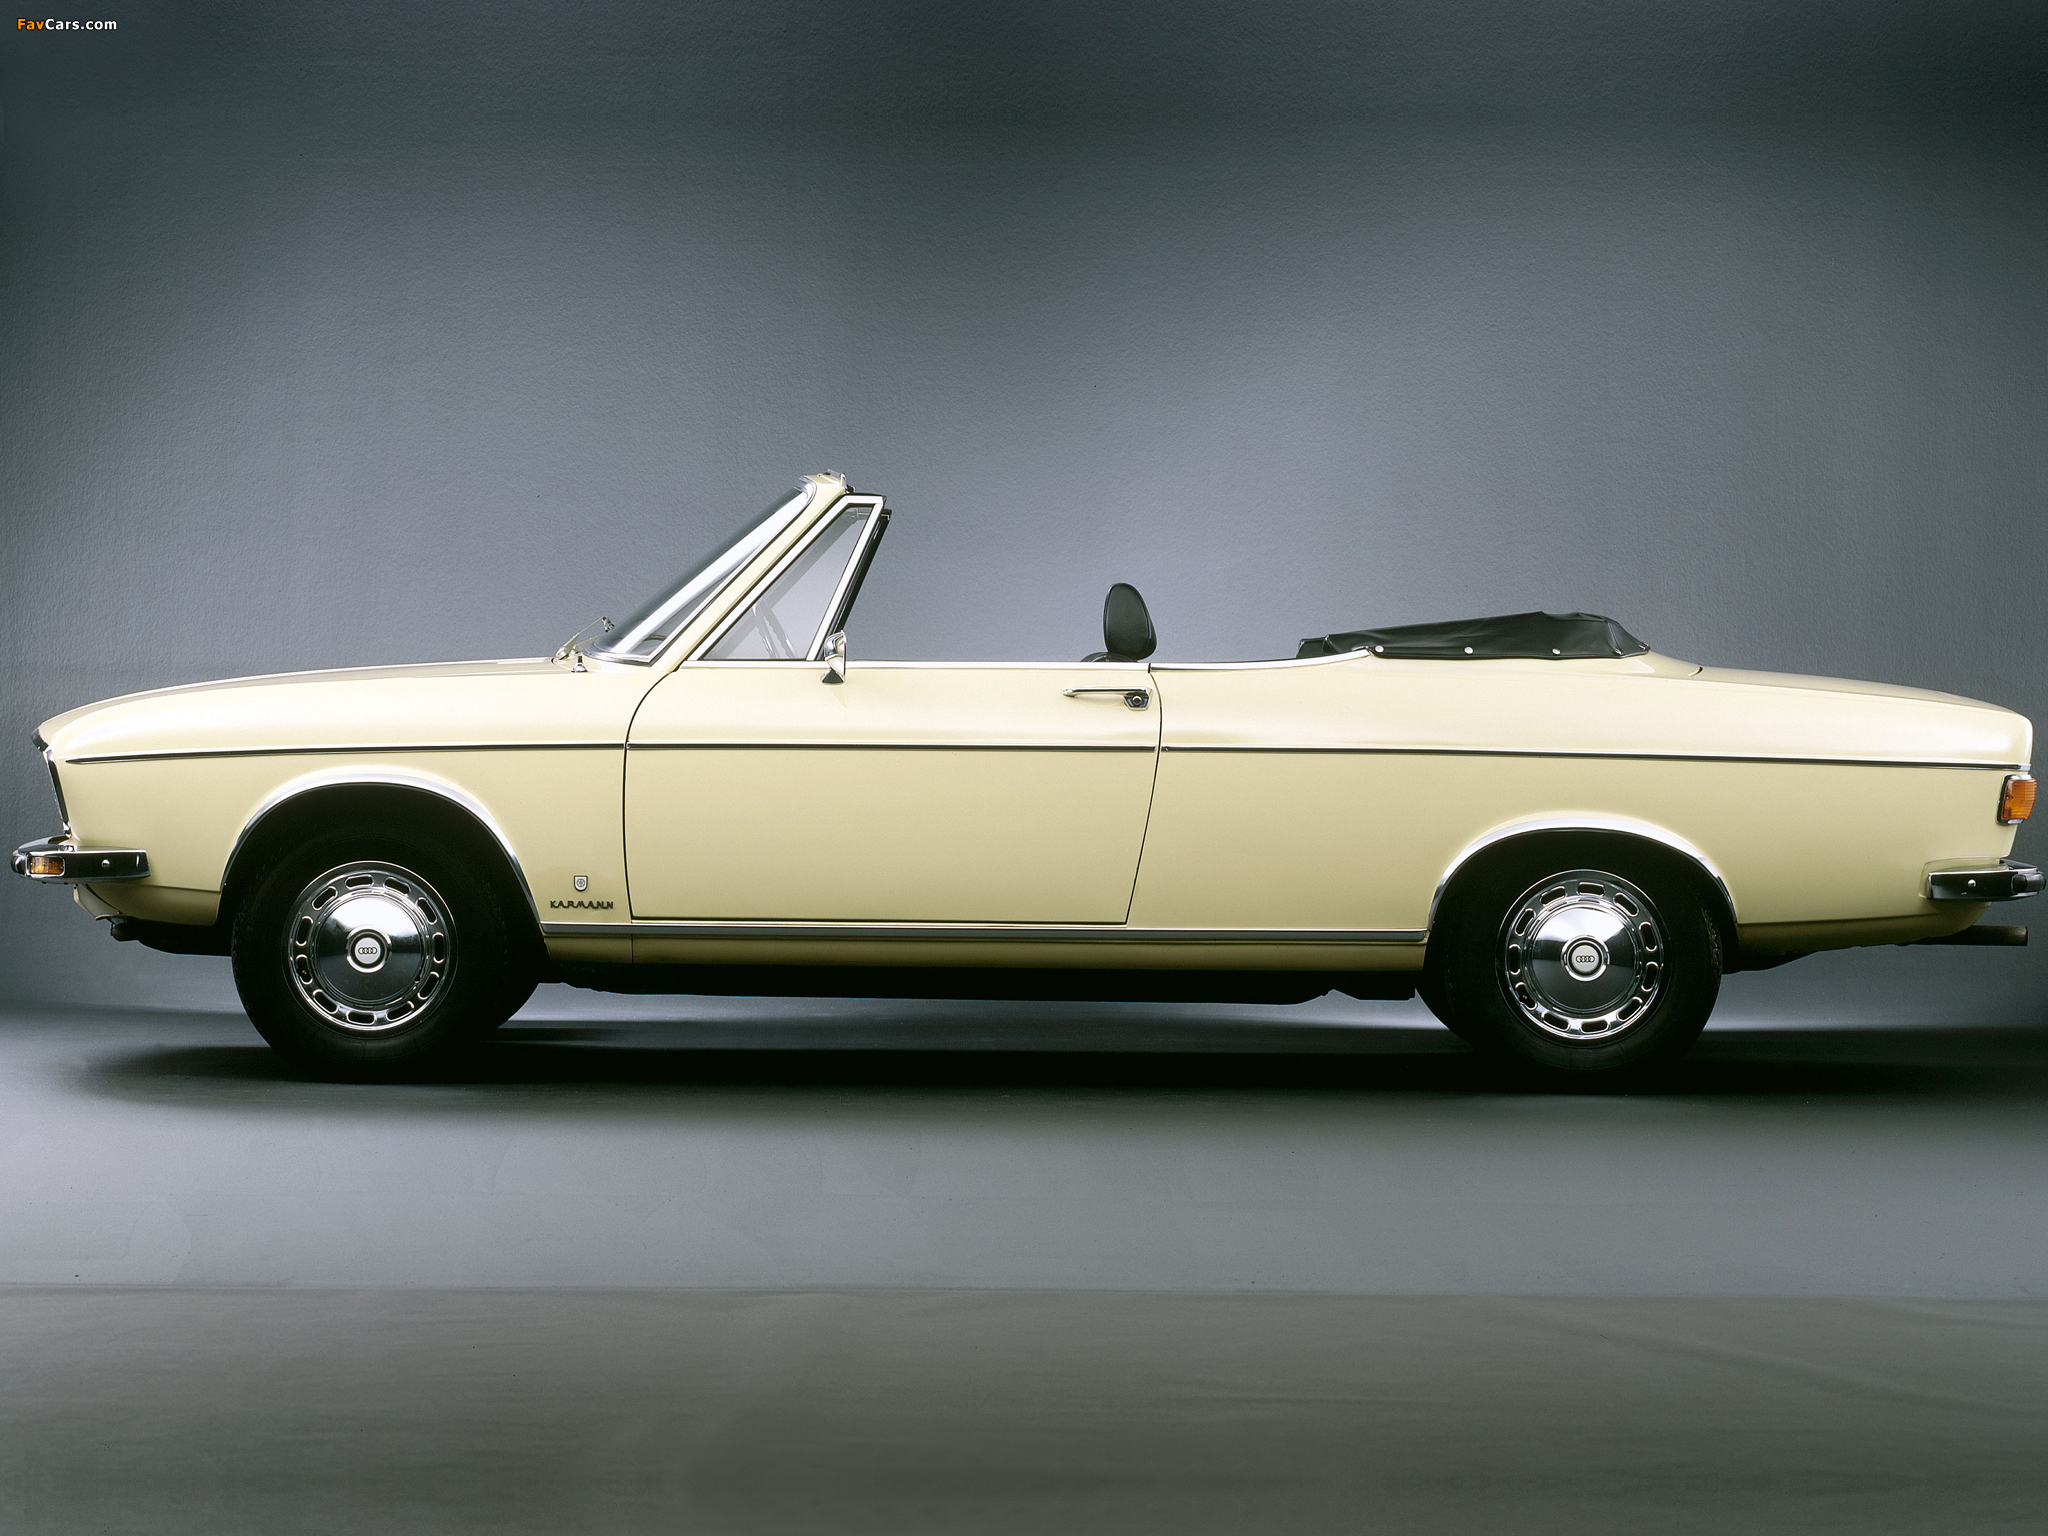 Audi 100 LS Cabriolet Prototype C1 (1969) photos (2048 x 1536)